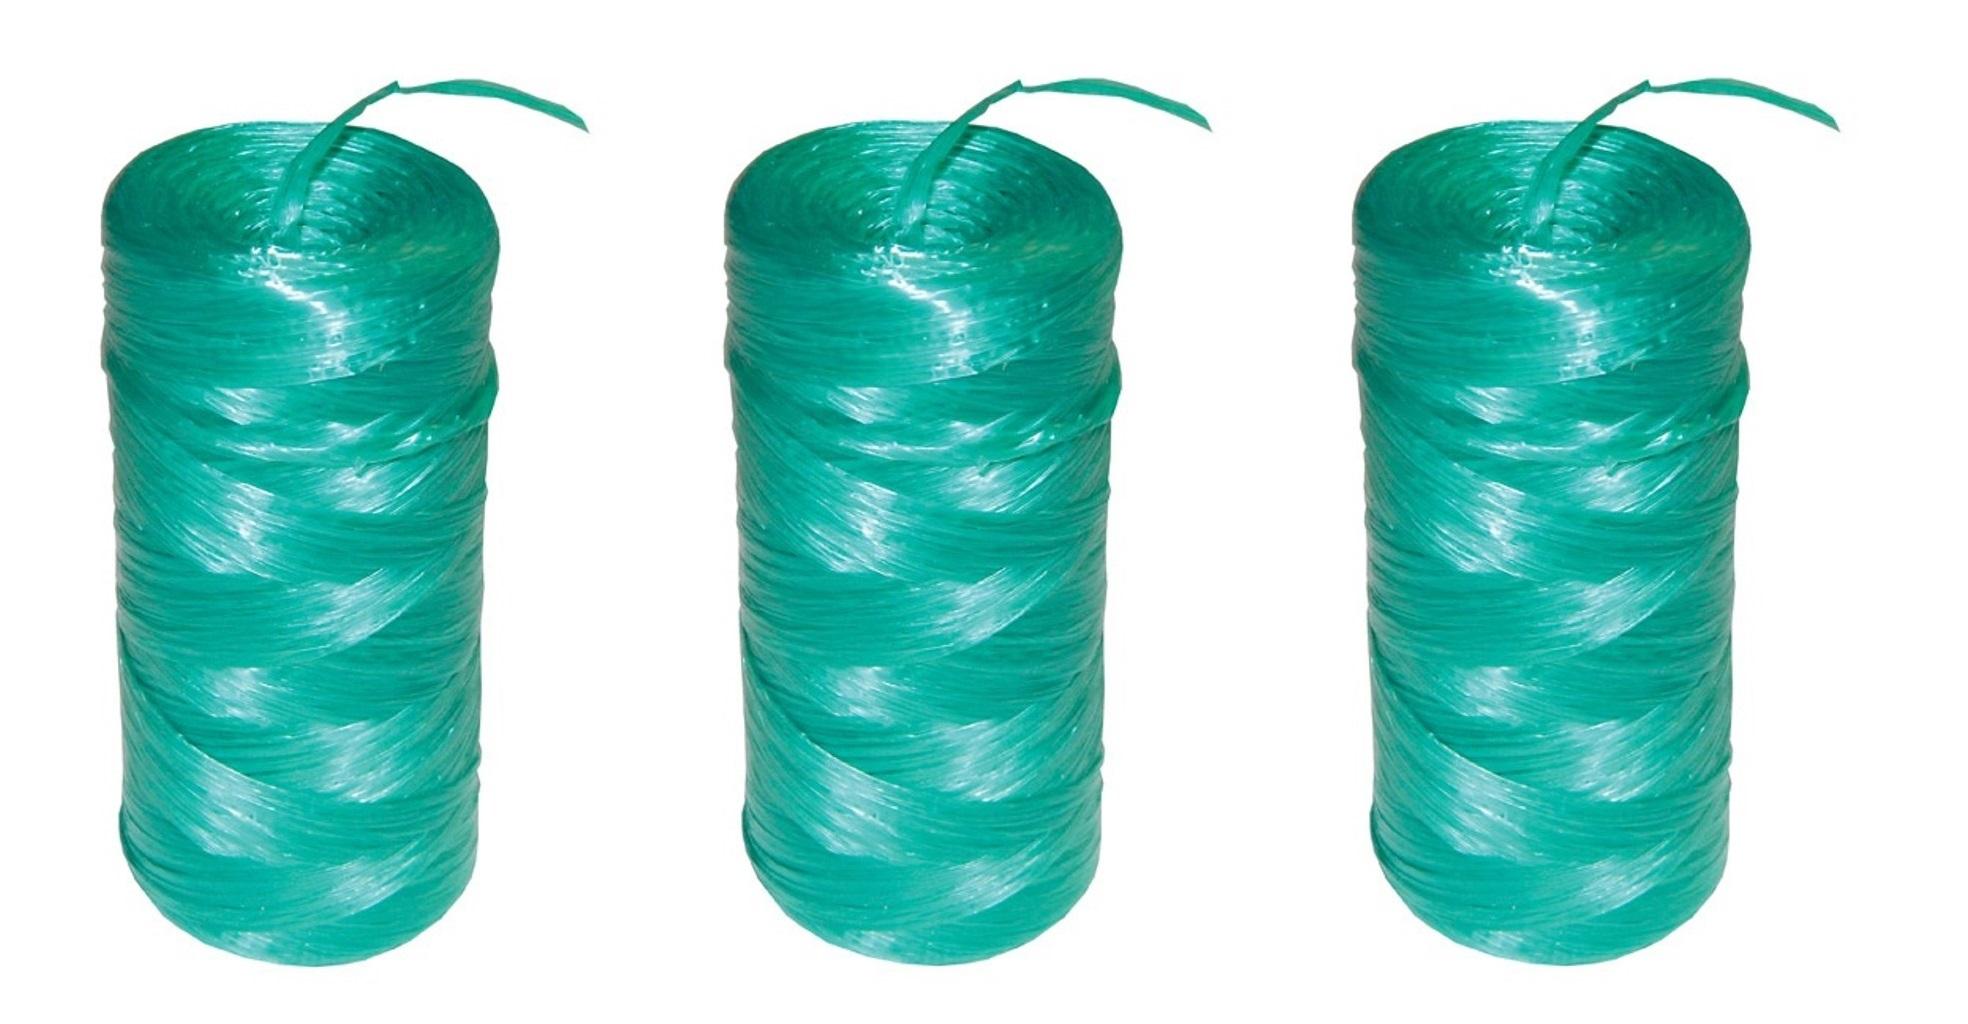 Verdon - Rafie sintetica pentru legat 100 gr.